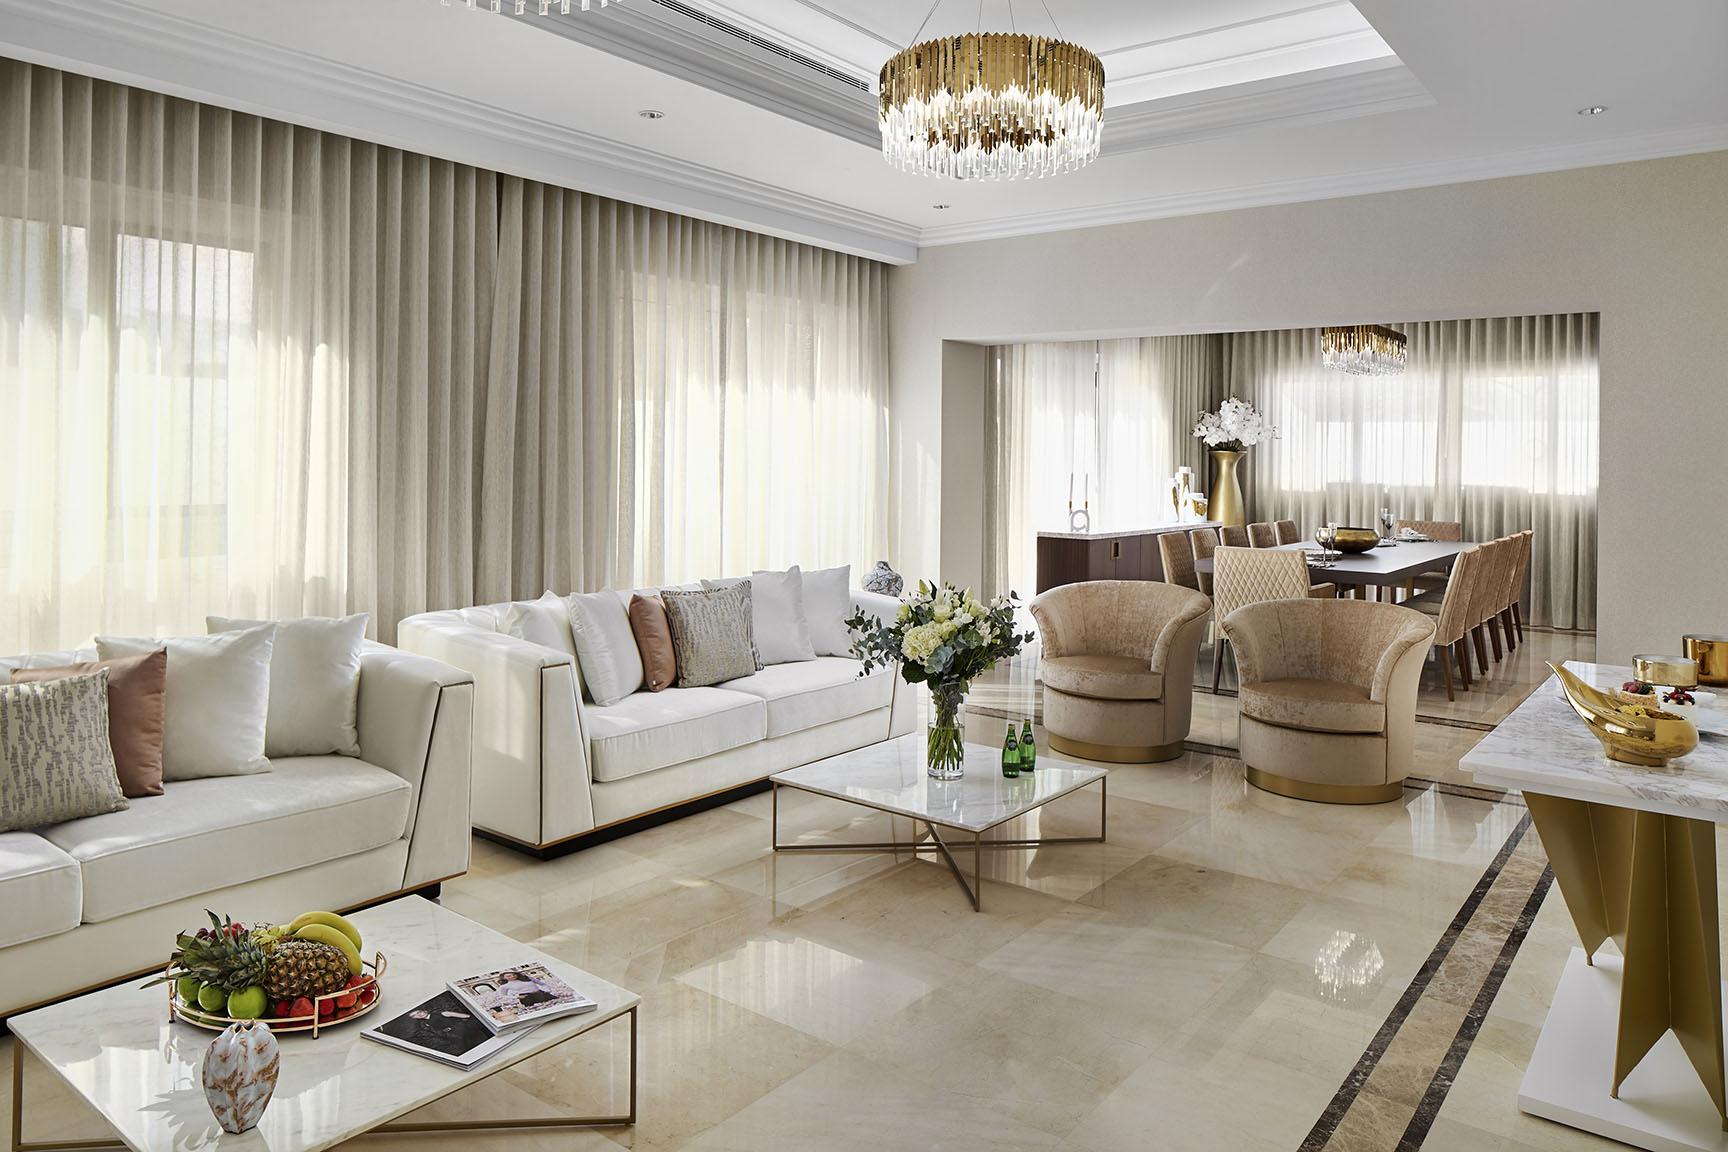 Dubai Interior Designers: The Top 10 Designers You Should Know About dubai interior designers Dubai Interior Designers: The Top 10 Designers You Should Know About Zen DistrictOne 378 11